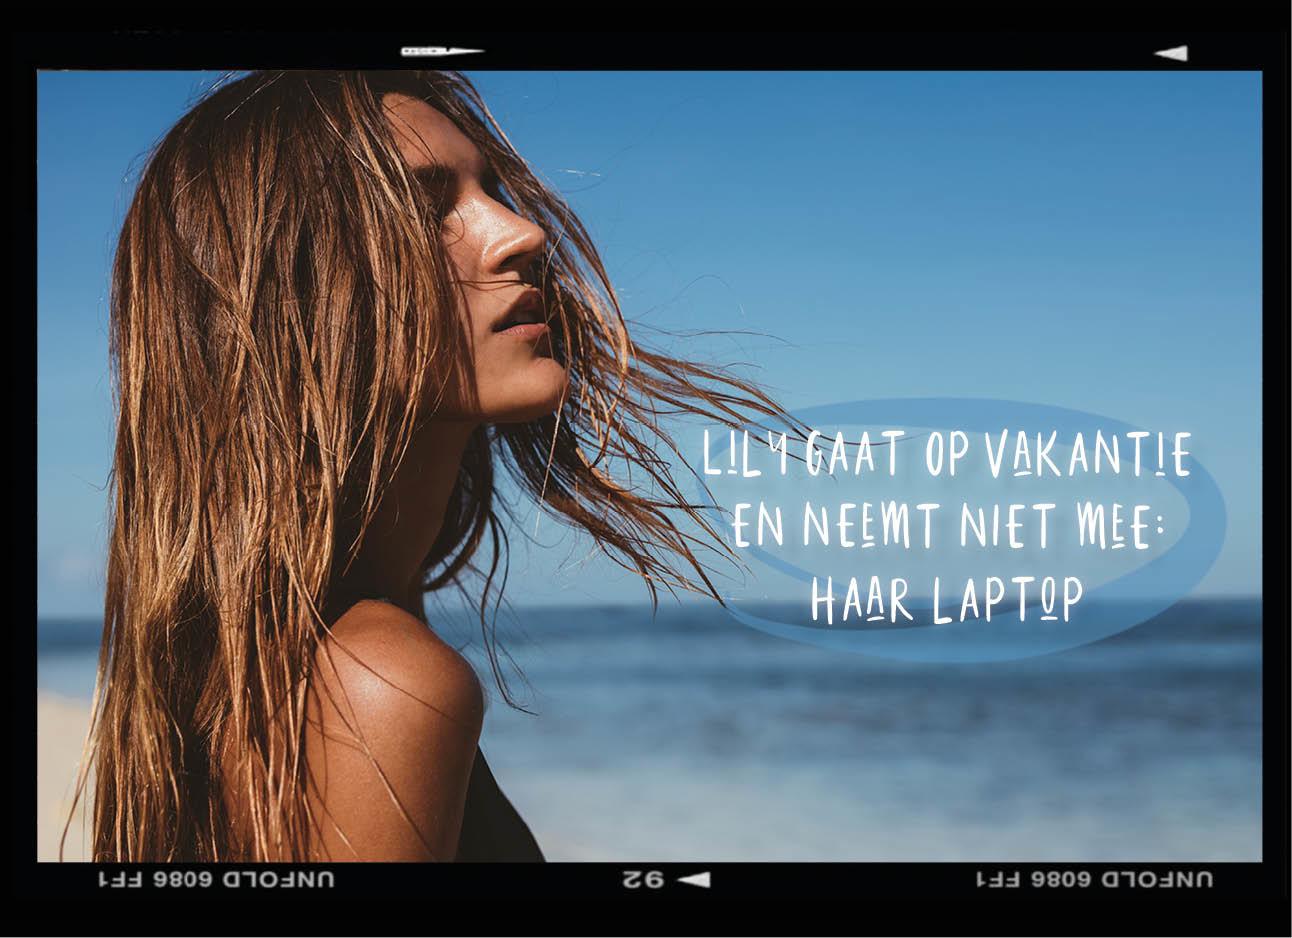 dagboek van een model, tan model, brown hair, beach